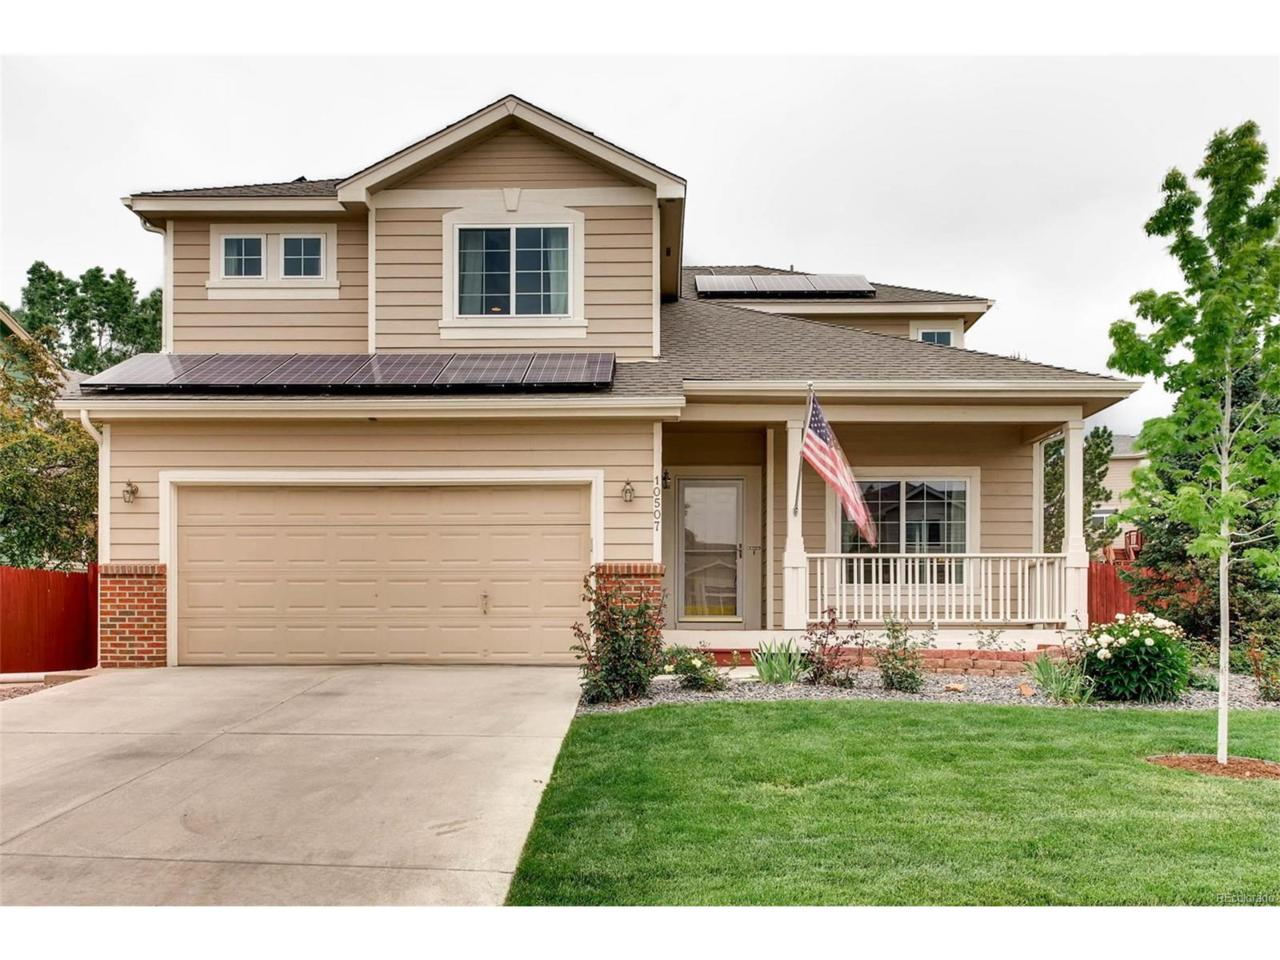 10507 W Cooper Drive, Littleton, CO 80127 (MLS #6353623) :: 8z Real Estate